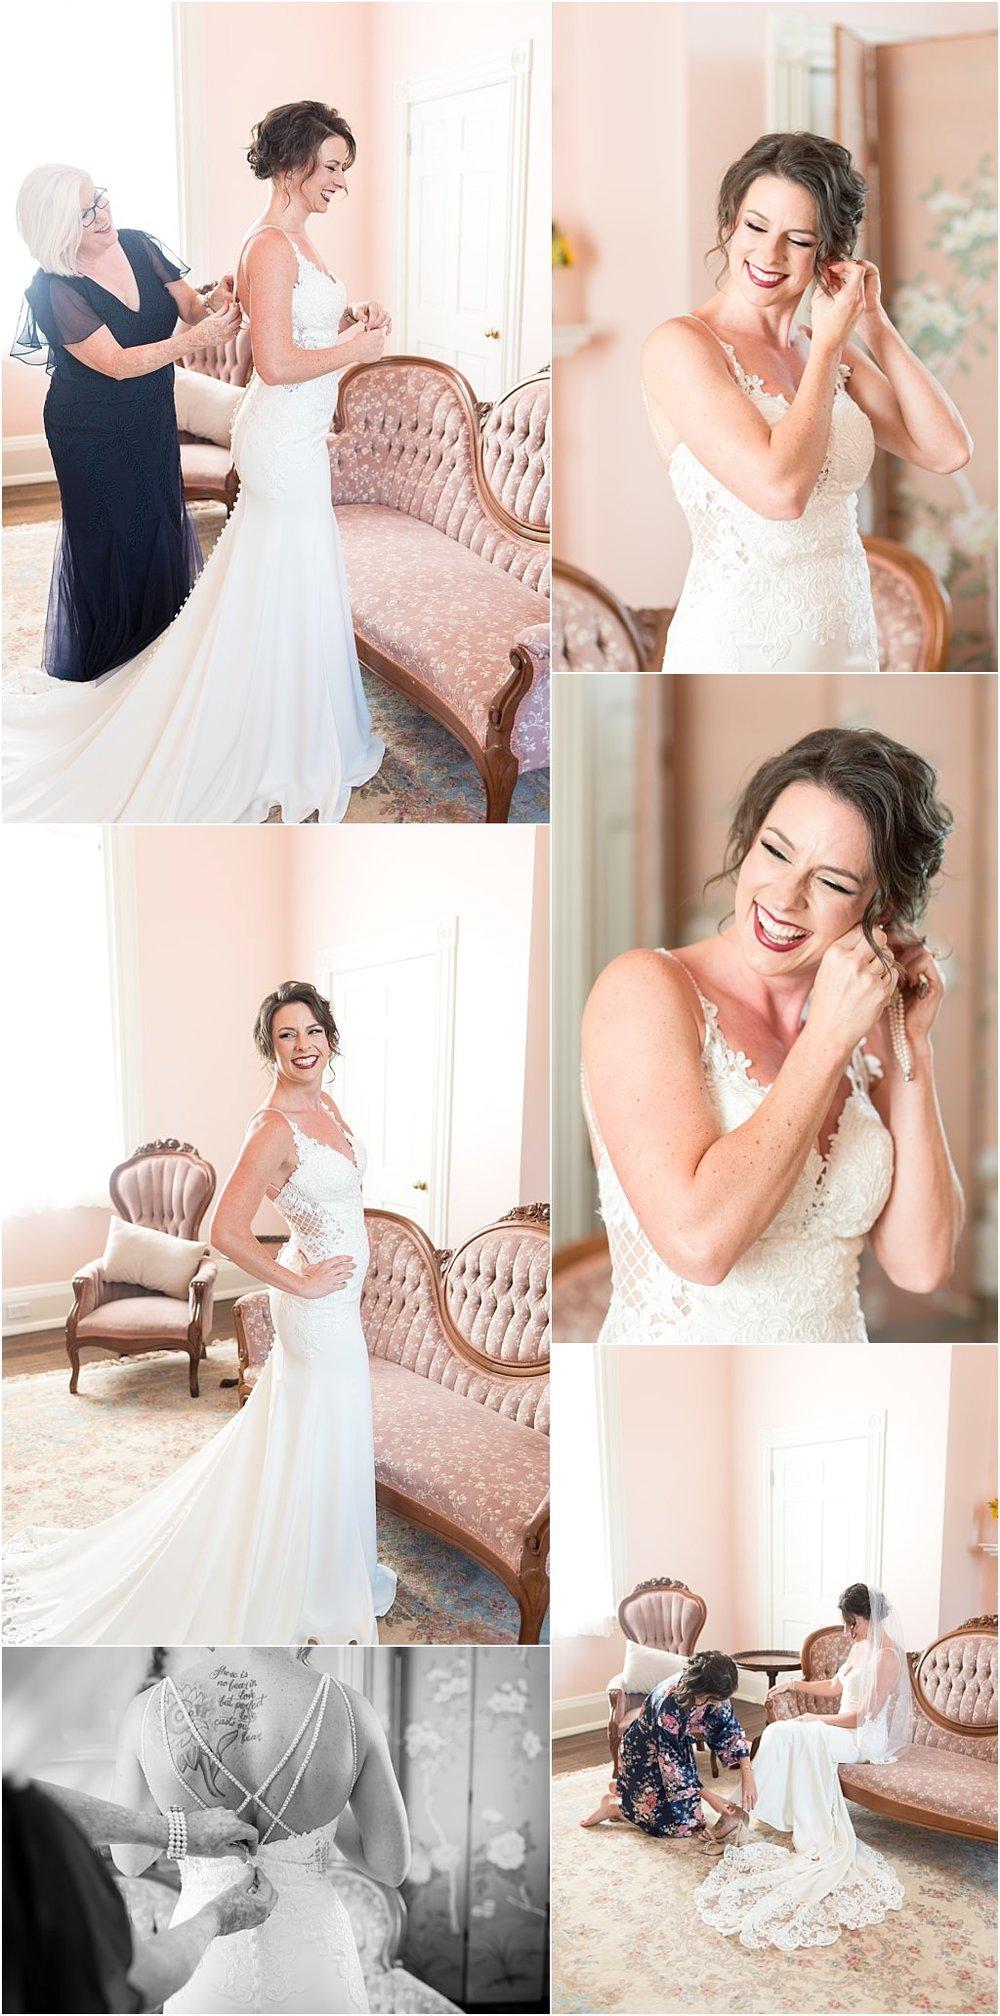 Jordan-and-Anna-Ravenswood-Mansion-Wedding-in-Brentwood-TN-Nashville-Wedding-Photographers+2